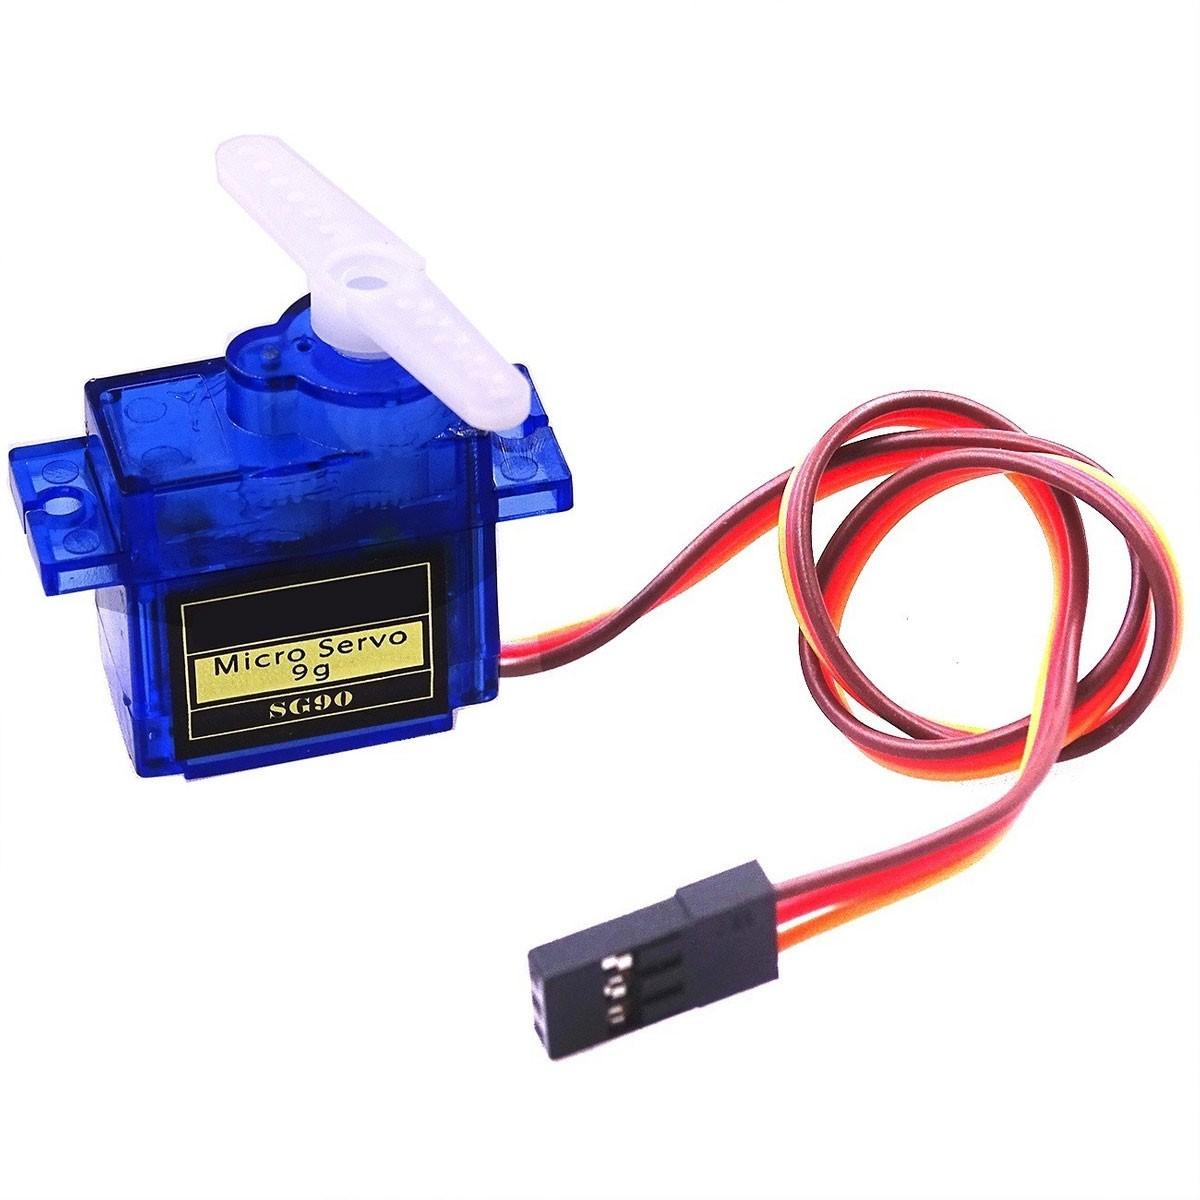 Micro Servo Motor 9G SG90